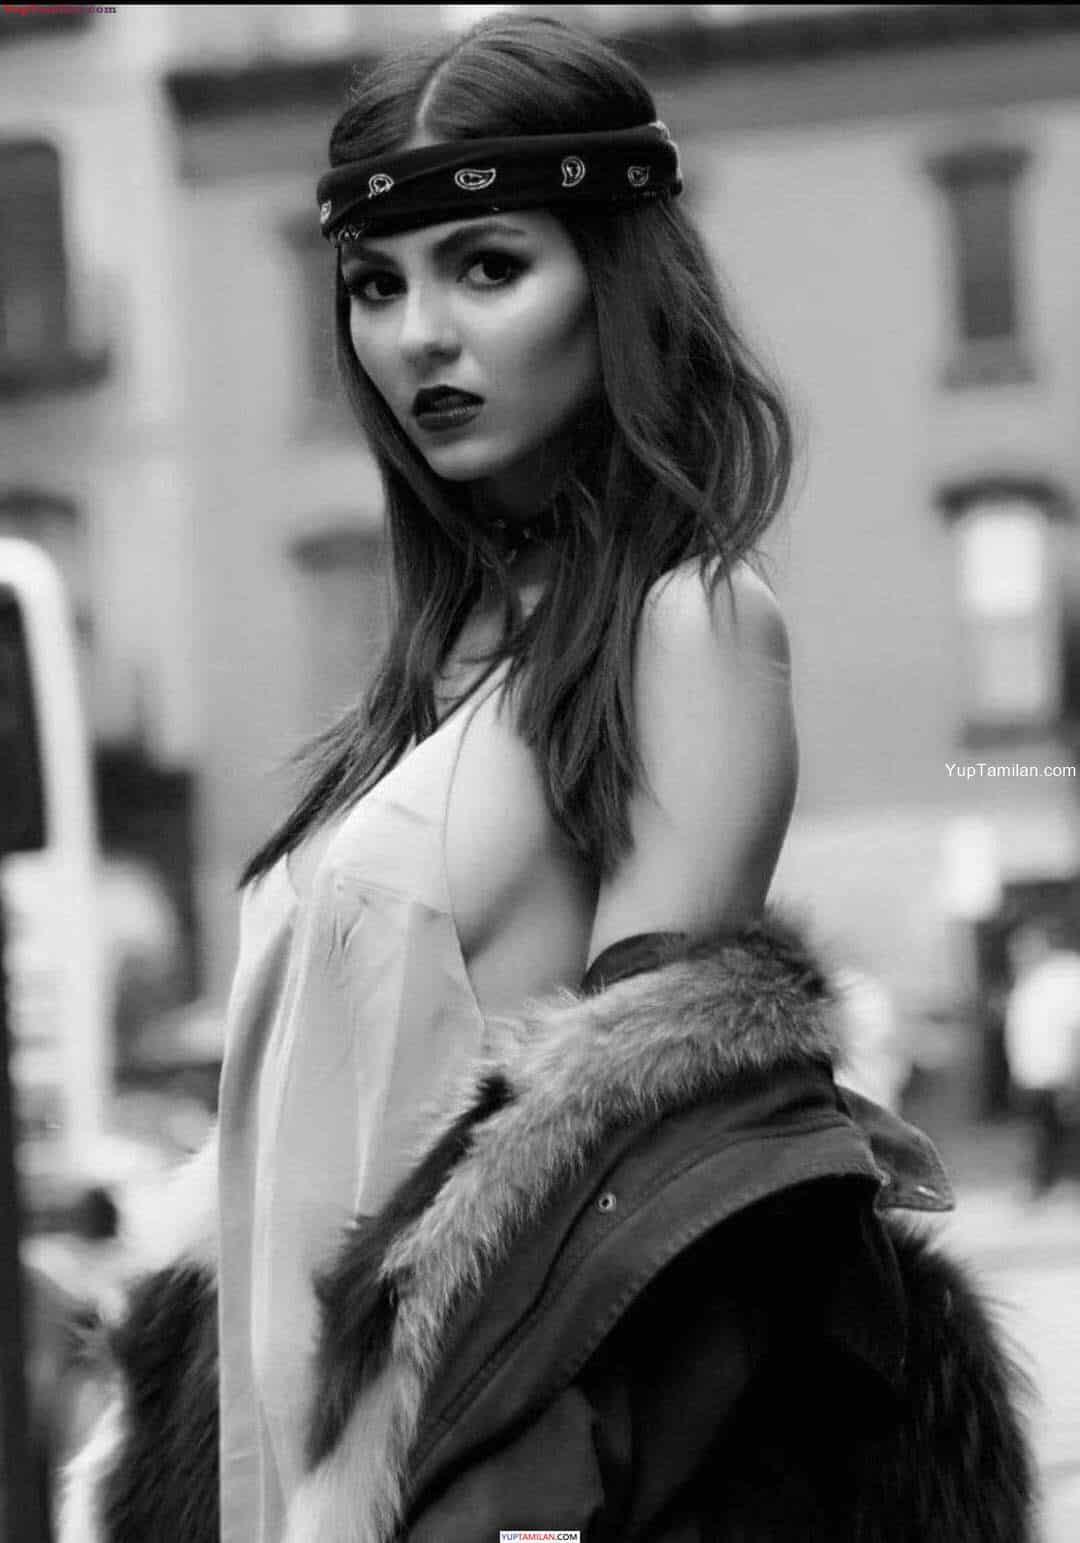 Victoria Justice Sexy Photos - Hot Bikini Pictures